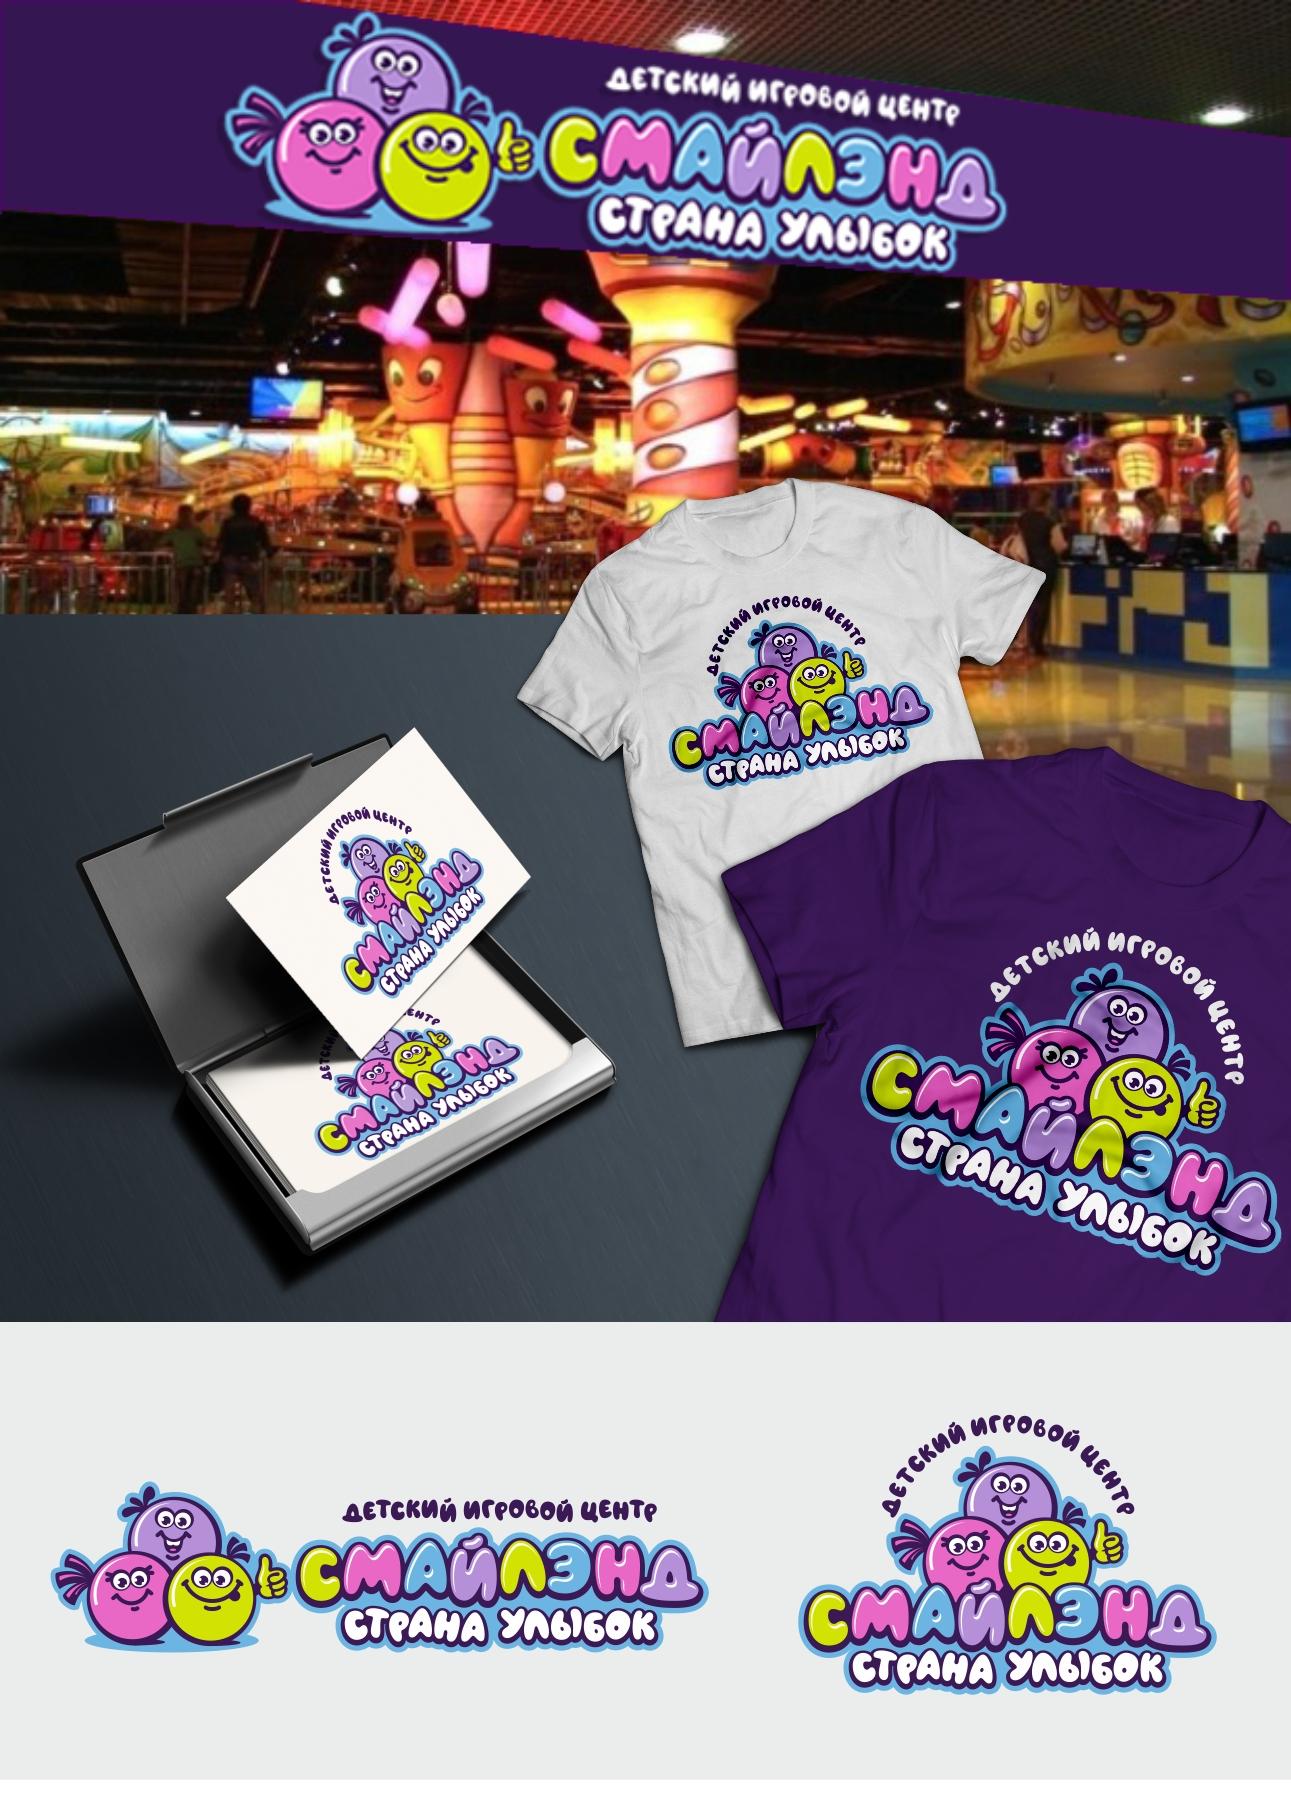 Логотип, стиль для детского игрового центра. фото f_8325a41b5aebd649.jpg